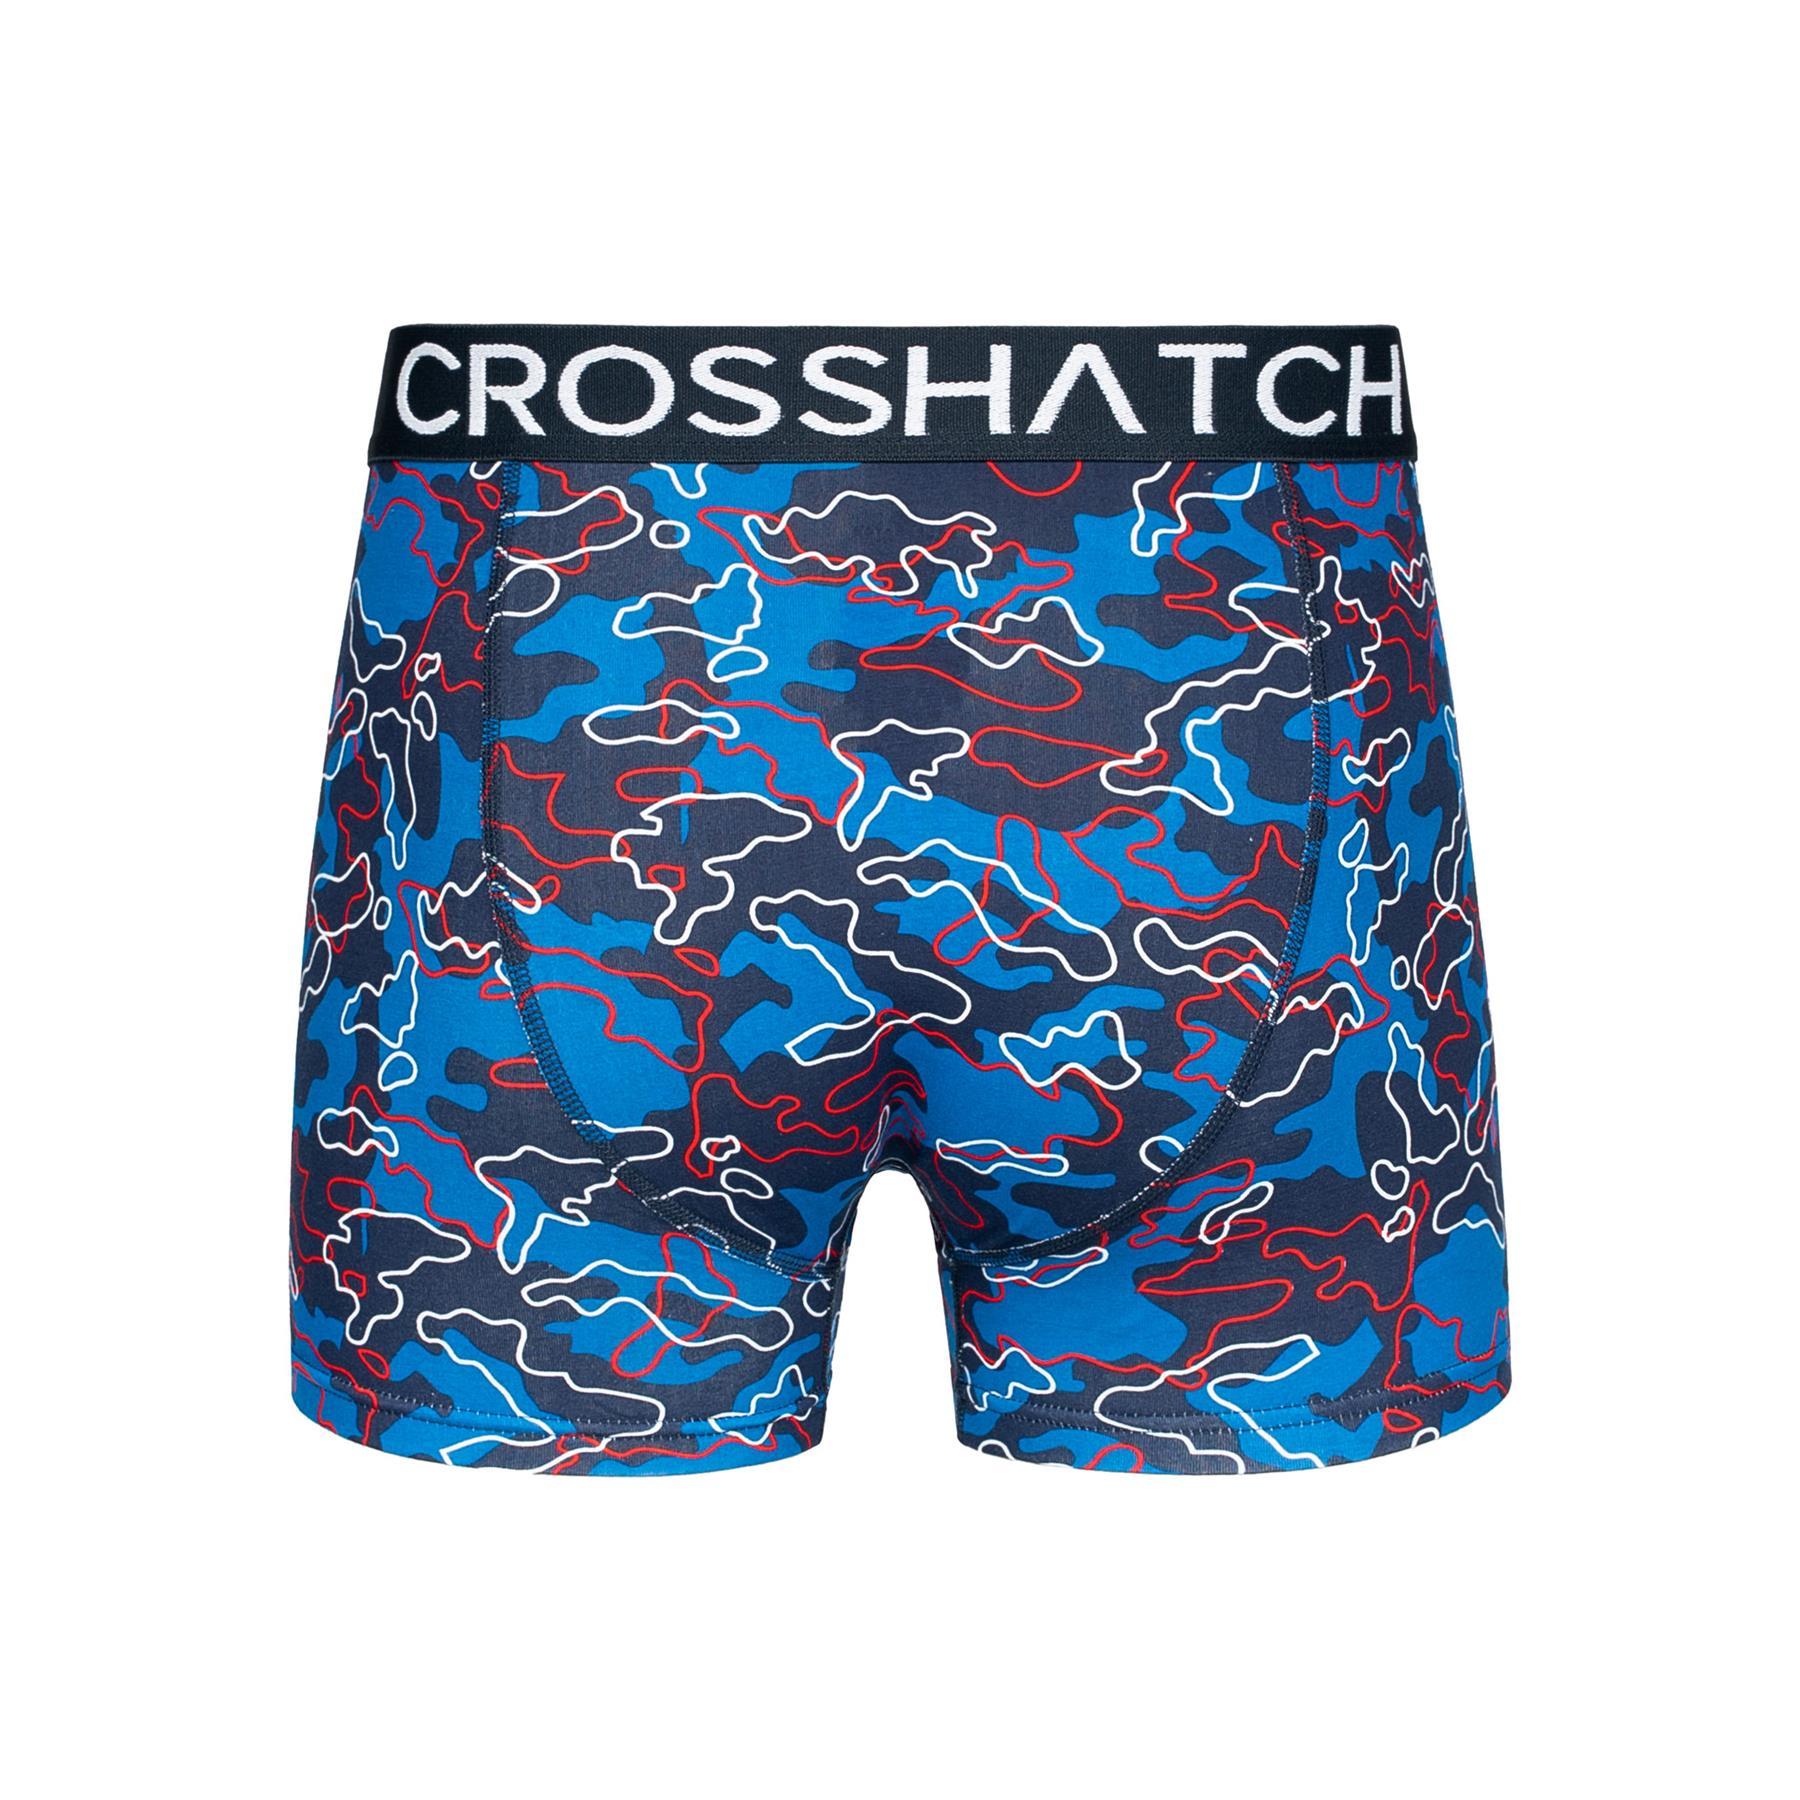 thumbnail 15 - Mens Crosshatch Boxers 3 Pack Shorts Underwear Trunks Underpants Multipack Sets